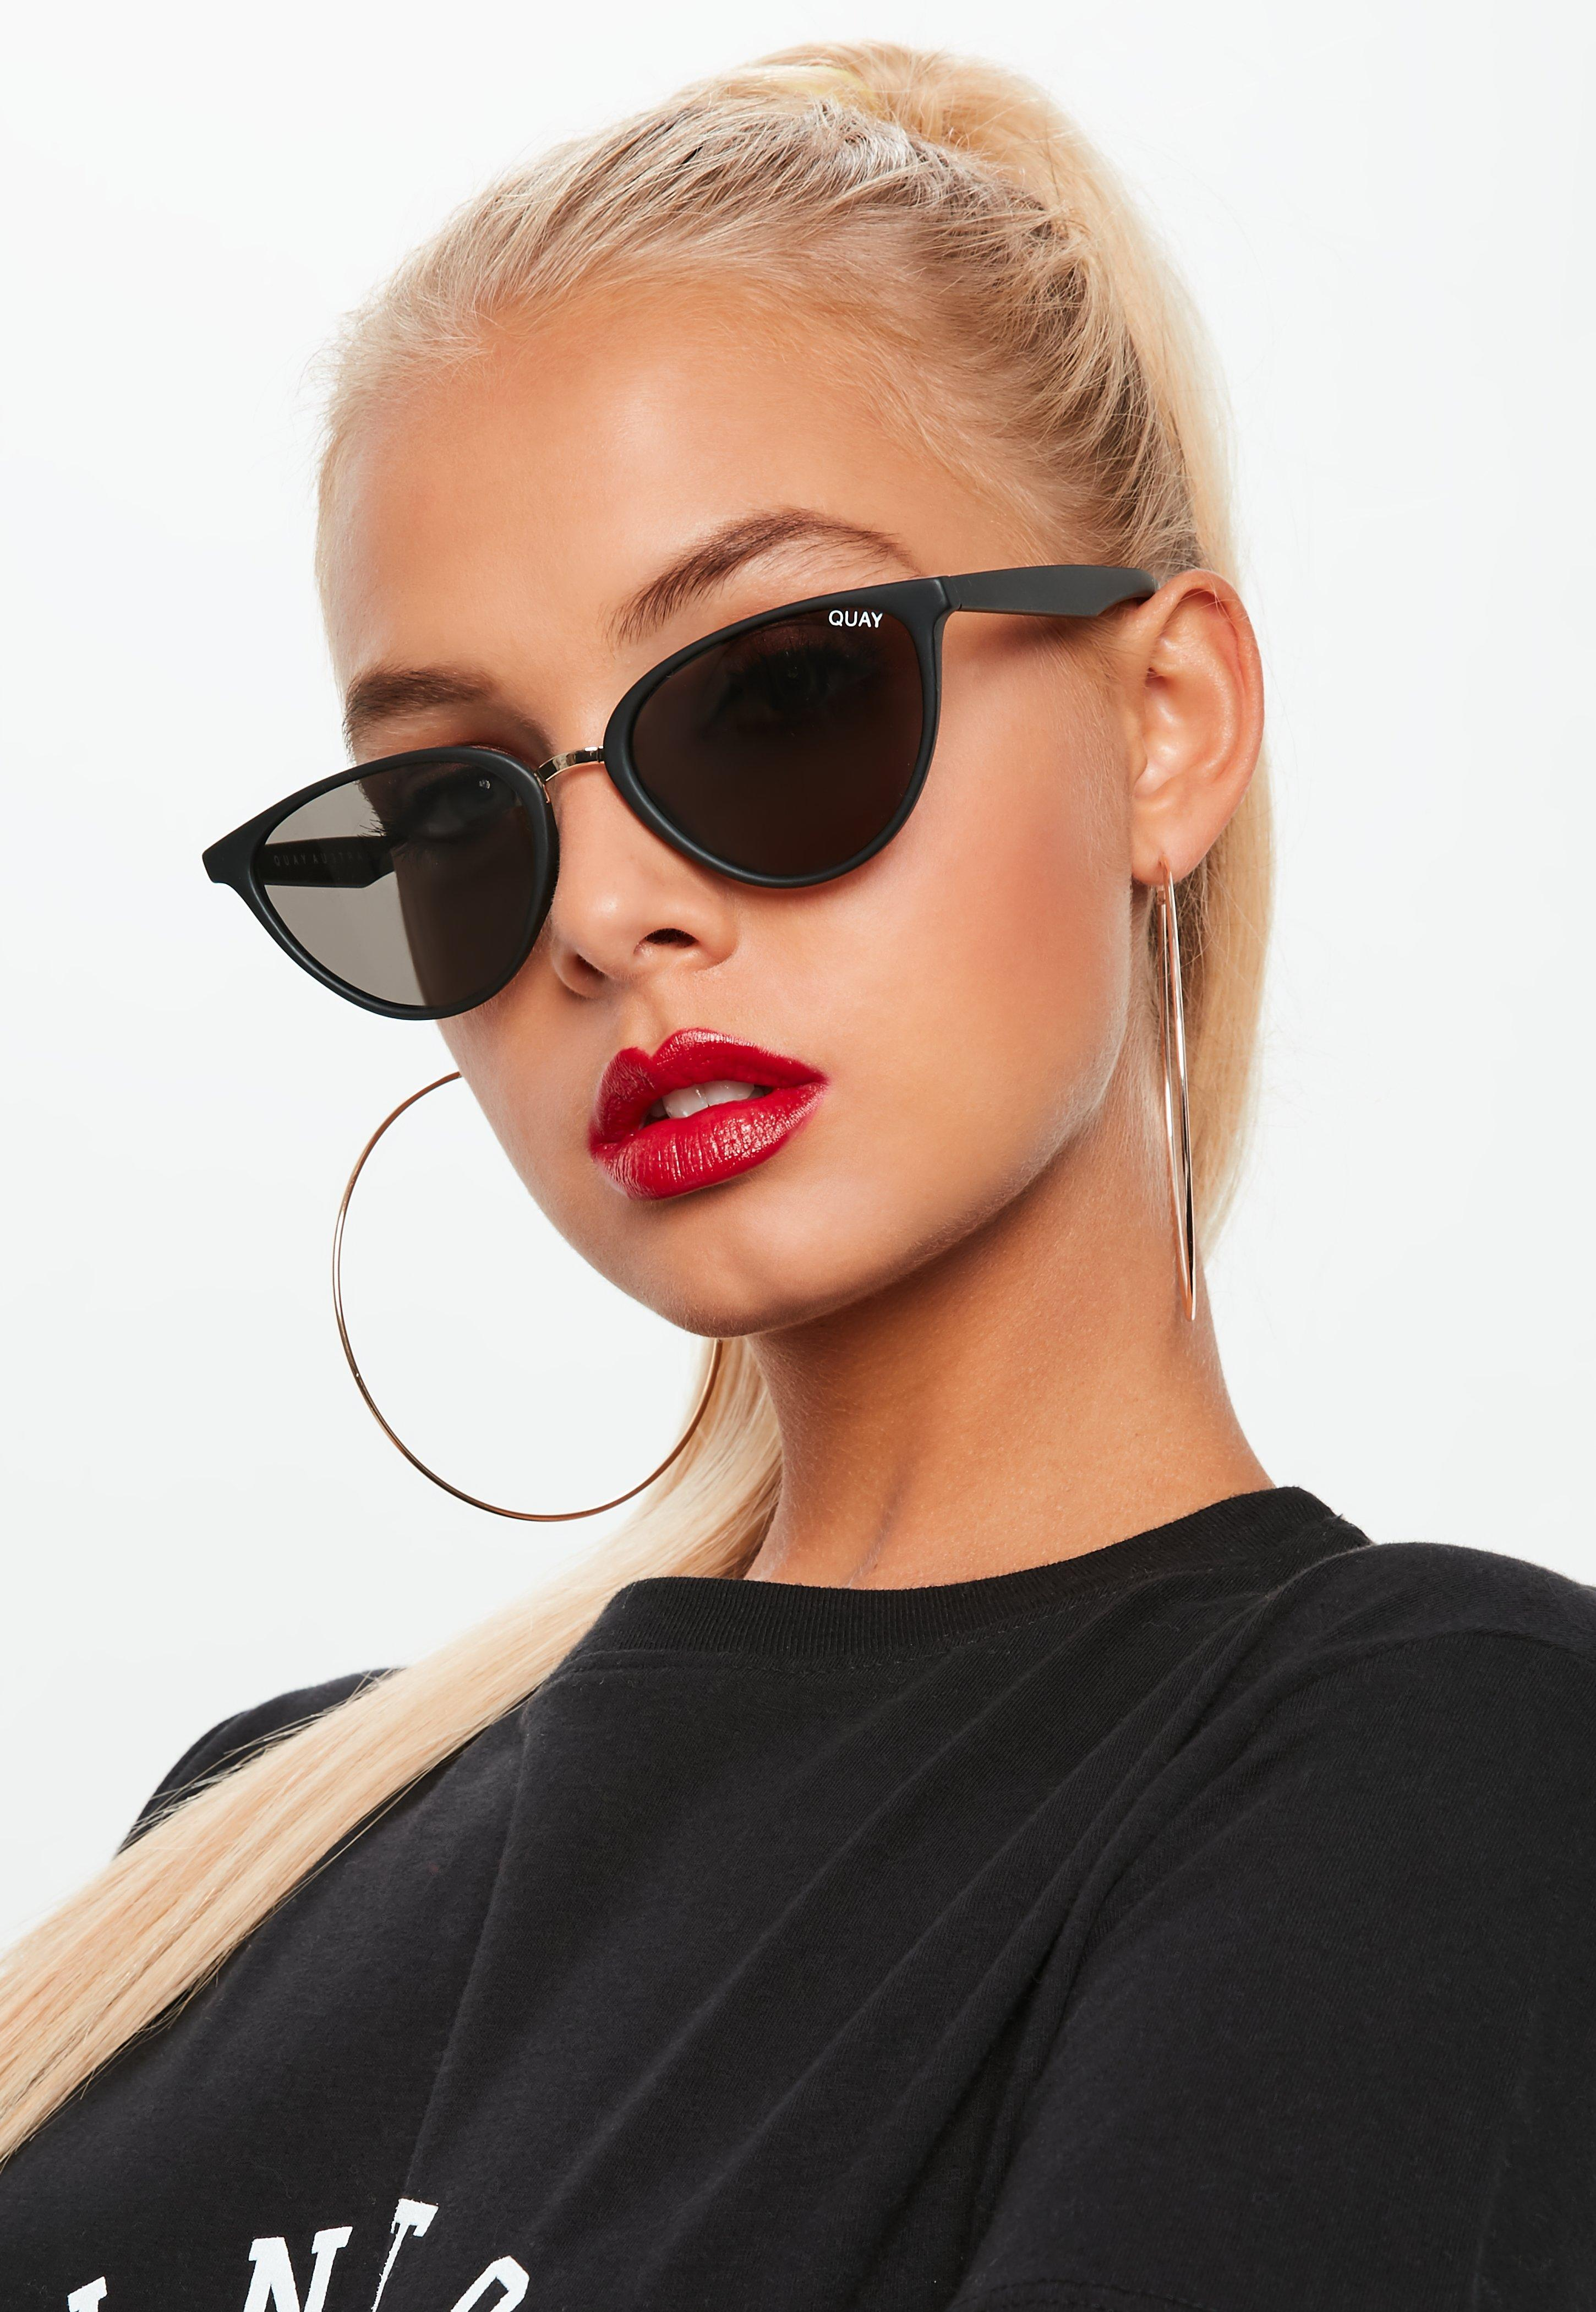 61275f98f7485 Quay Australia Black Rumours Sunglasses